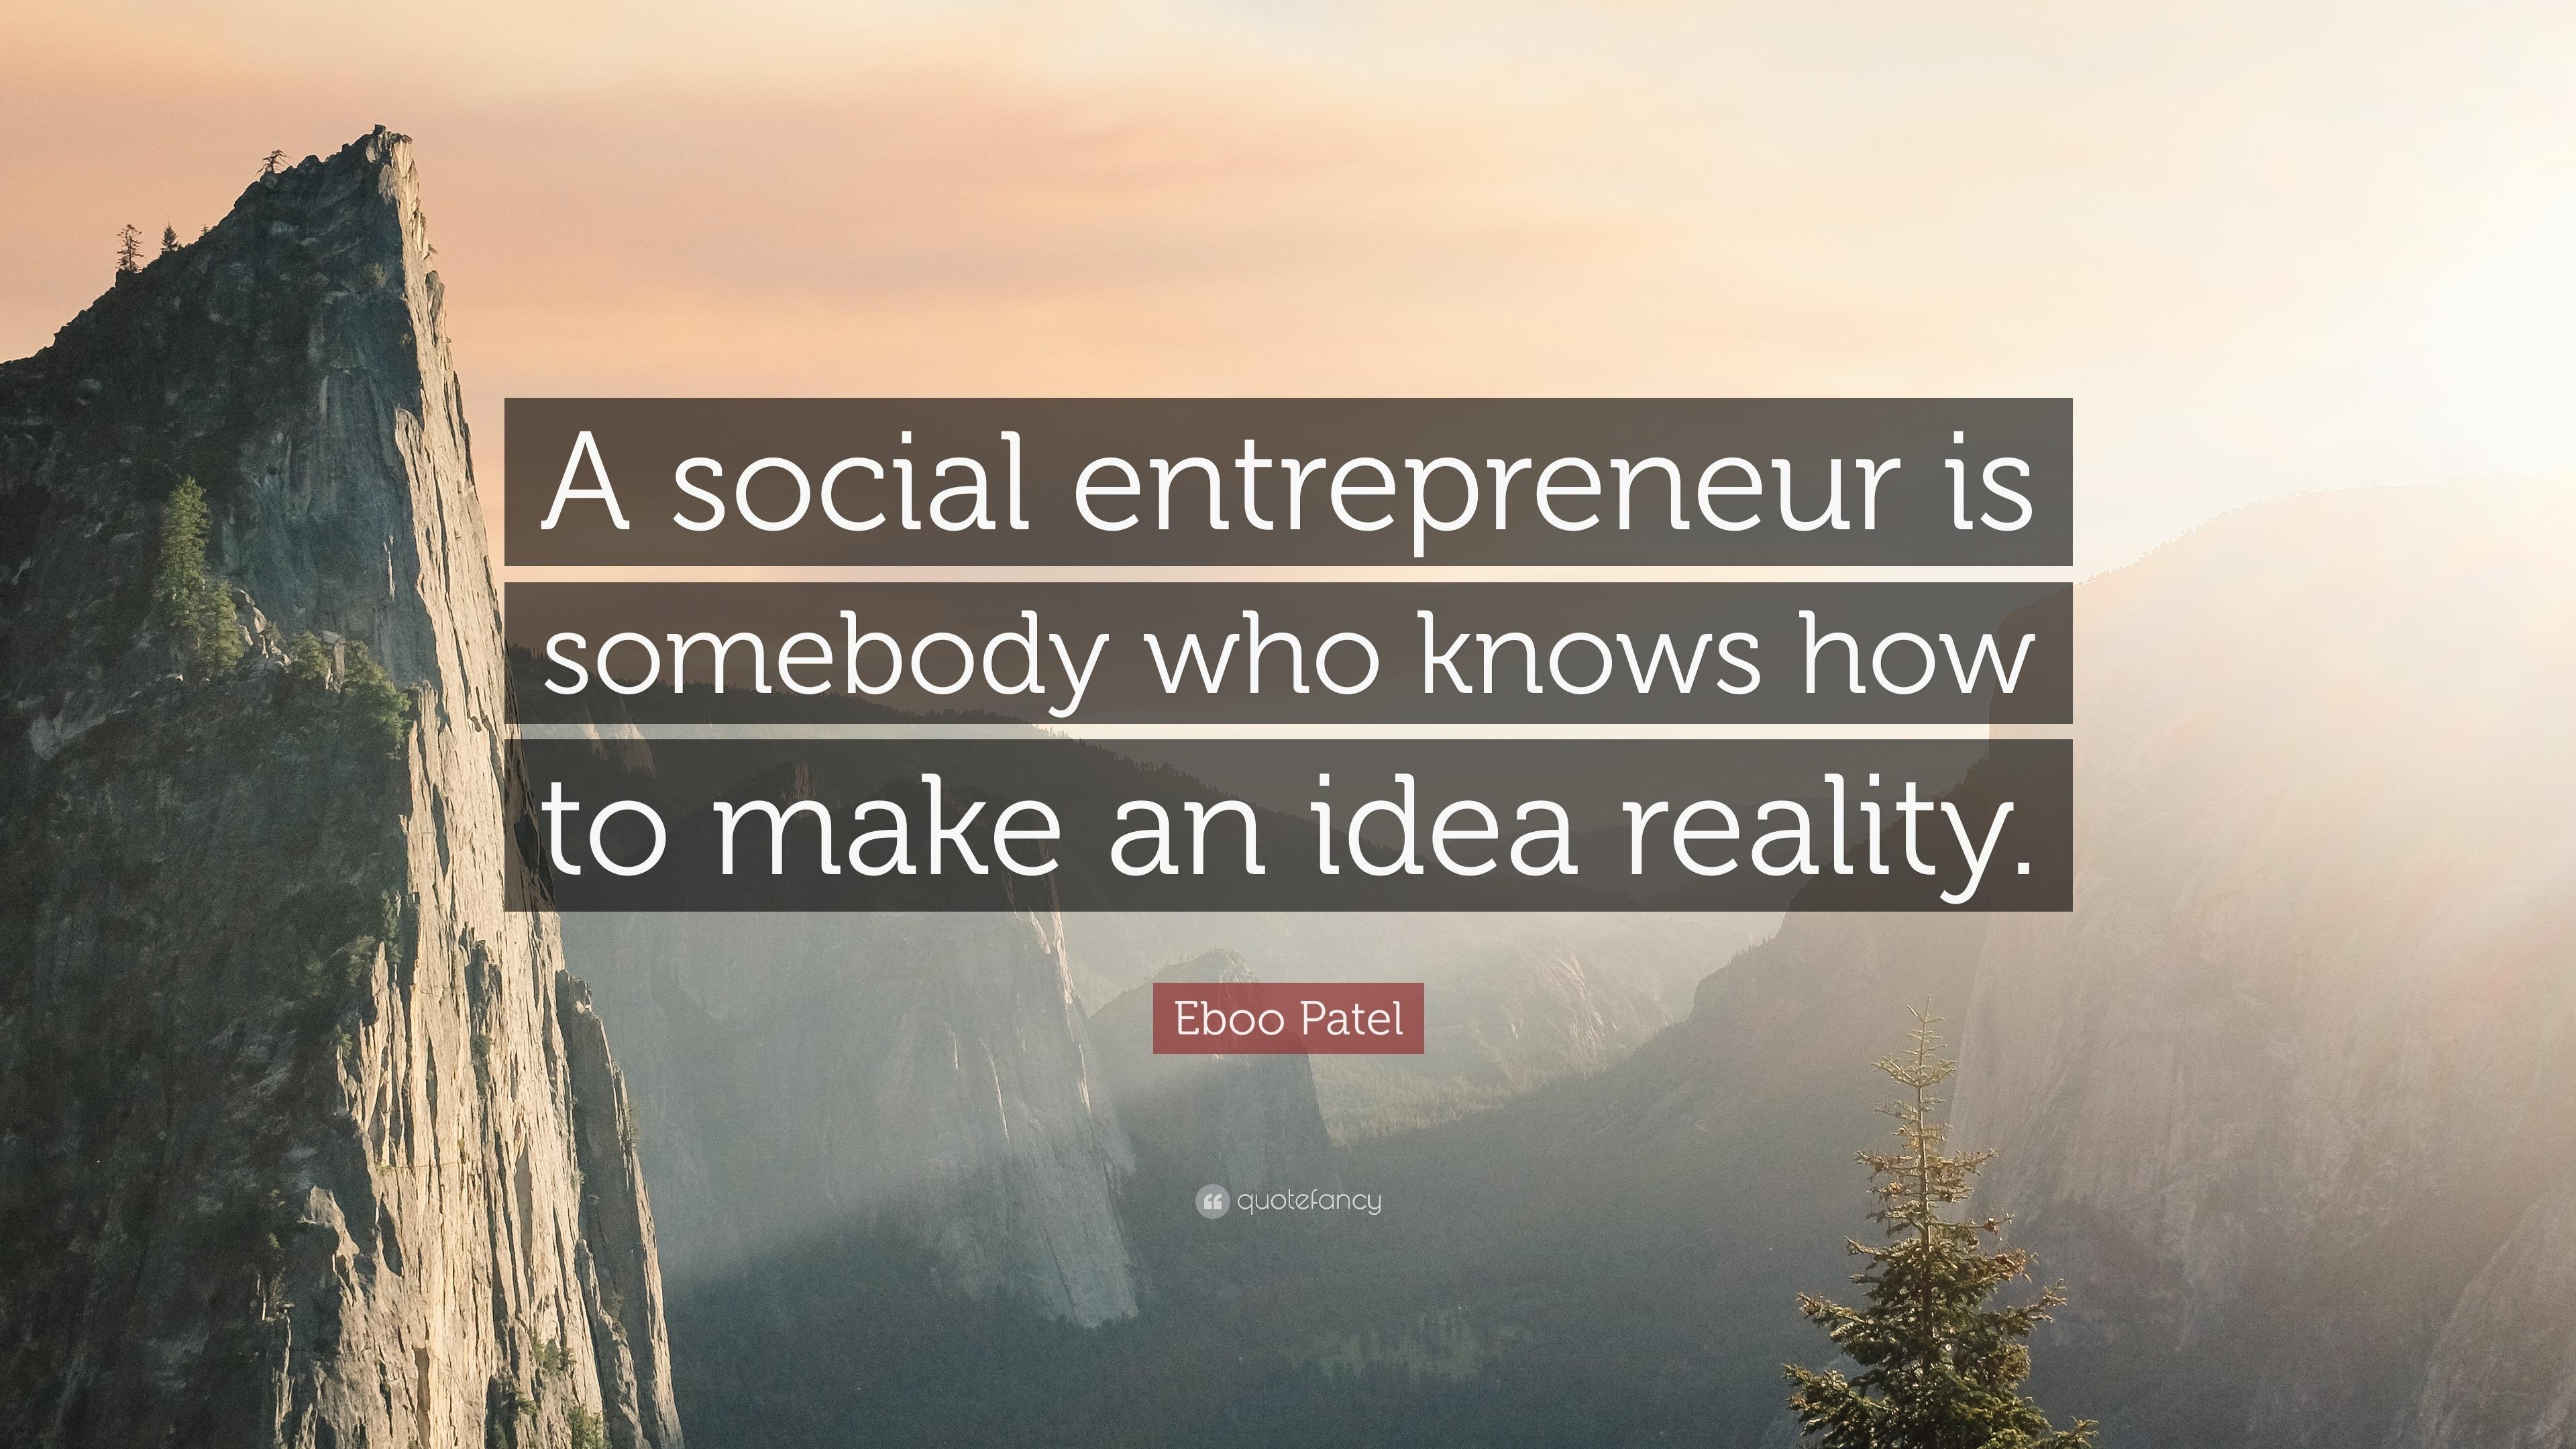 Eboo patel quotes 12 wallpapers quotefancy - Entrepreneur wallpaper ...